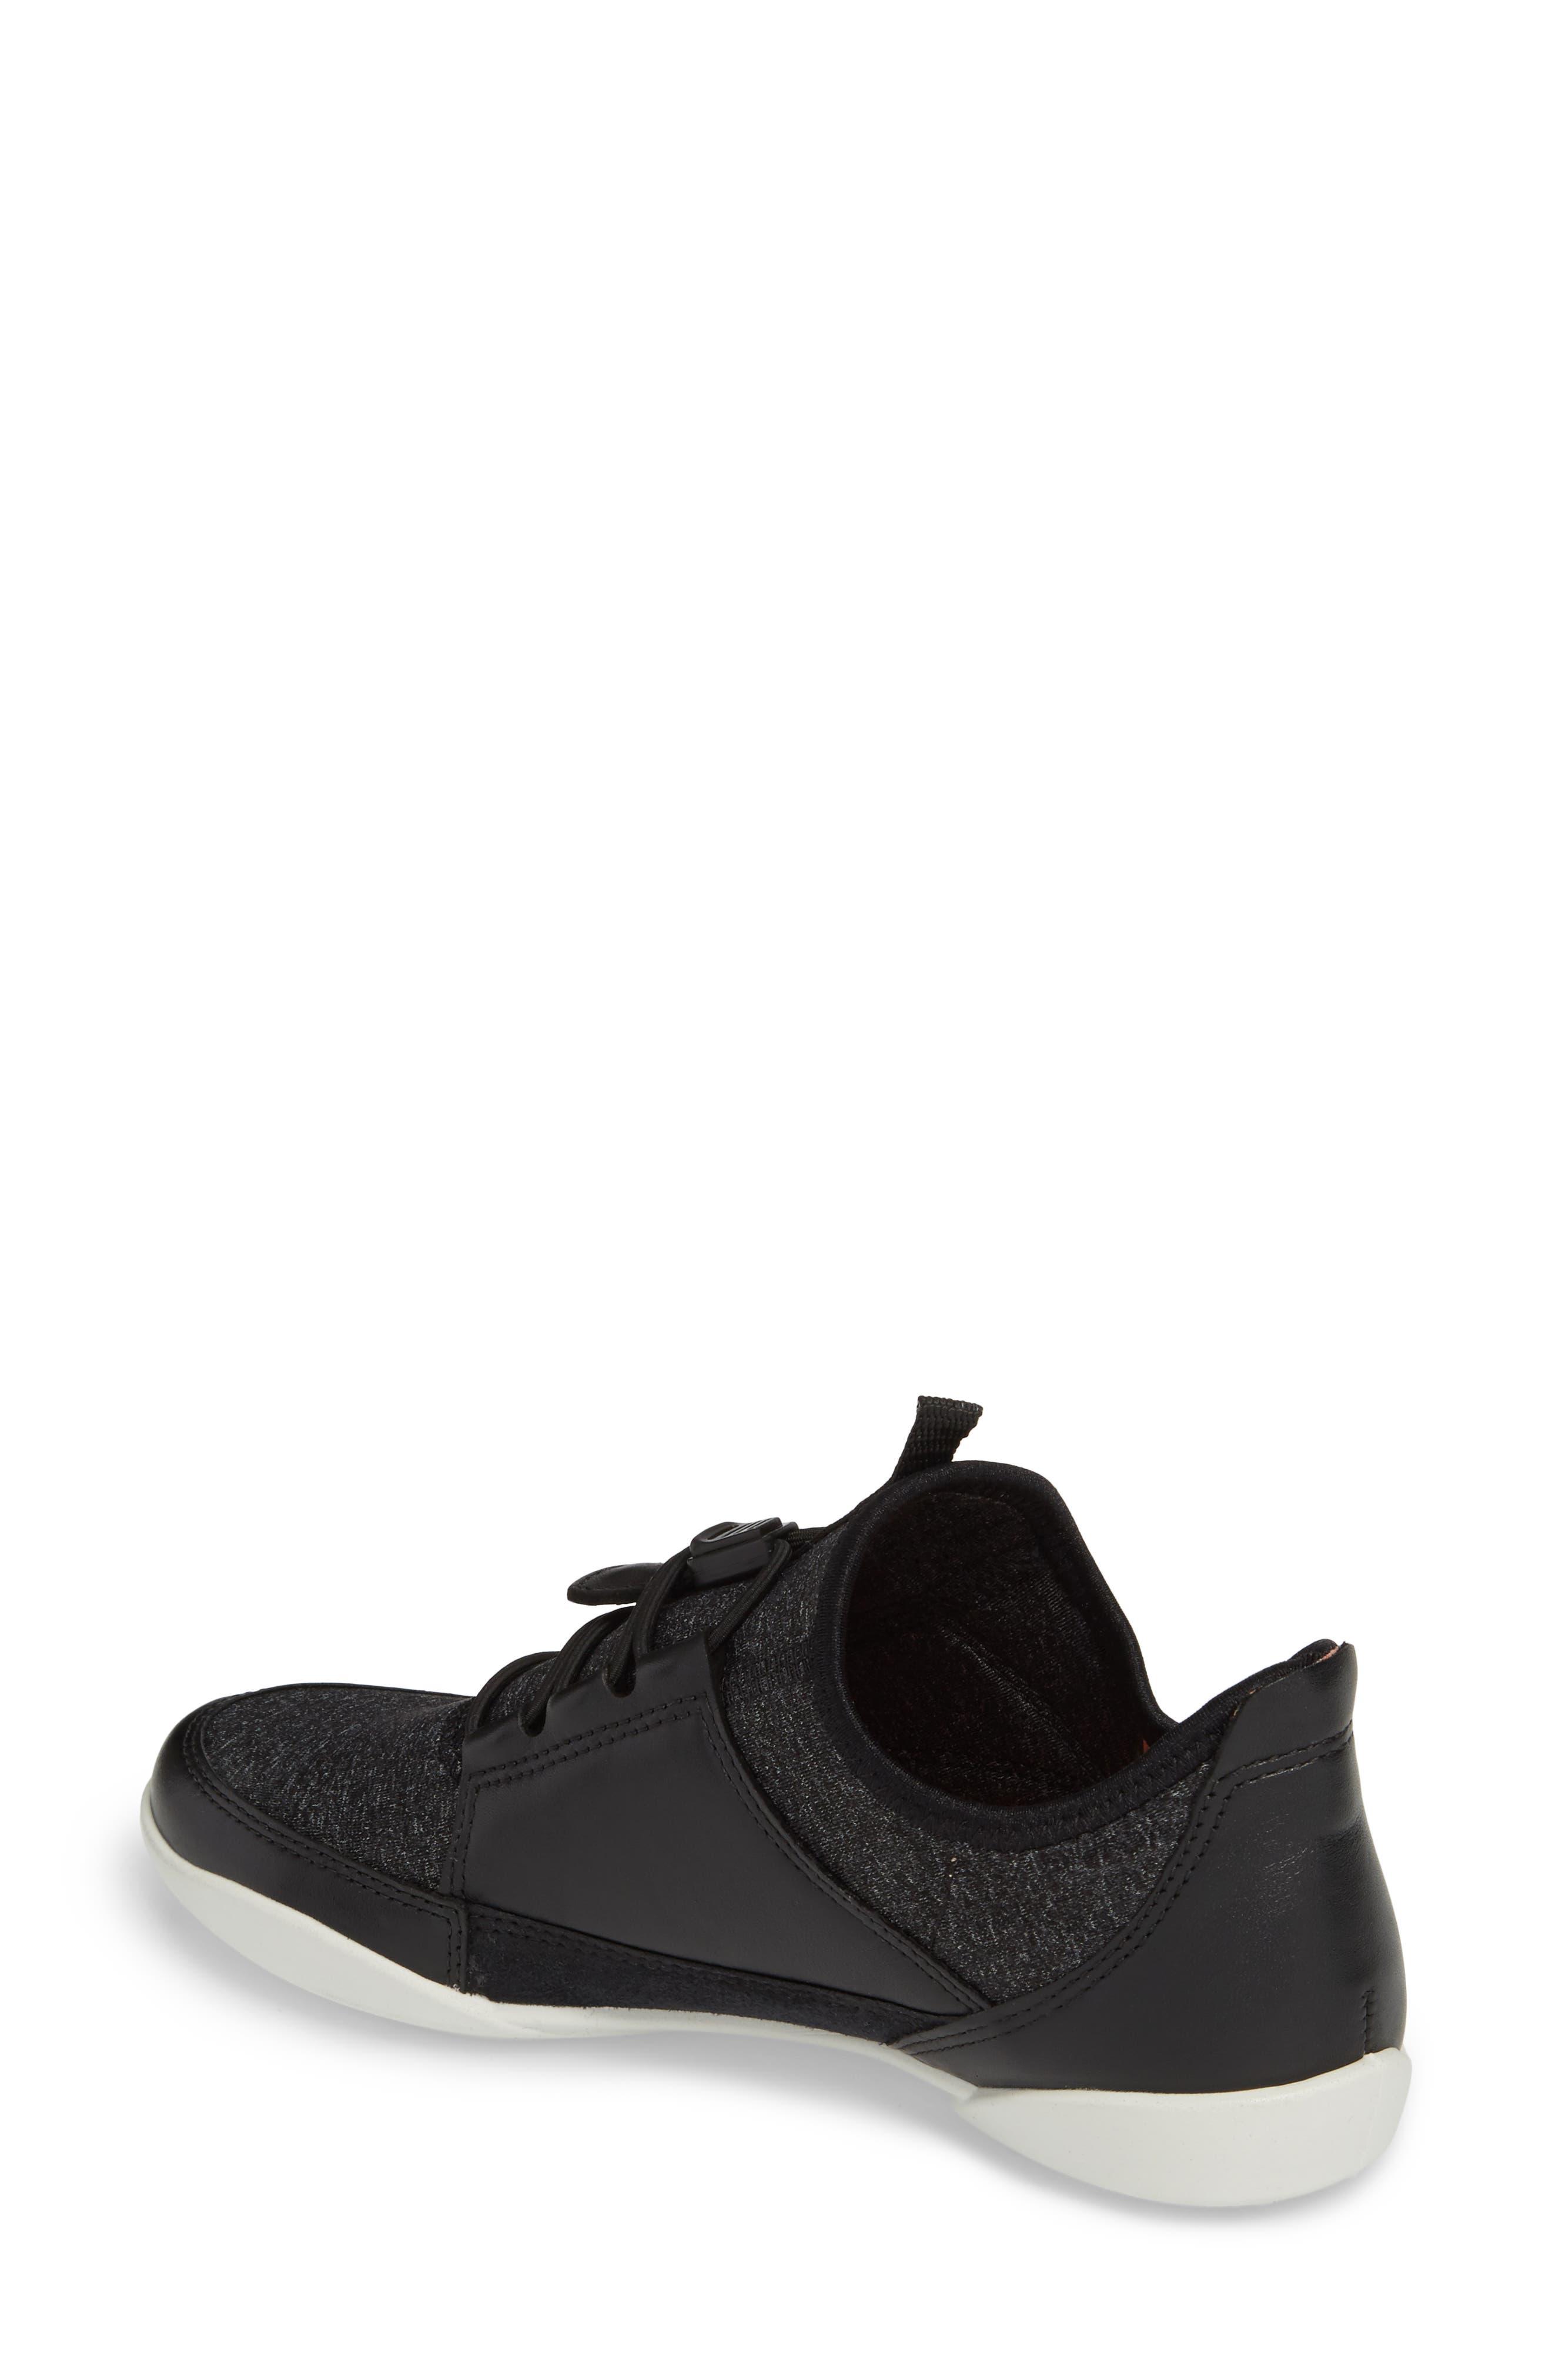 Bluma Speedlace Sneaker,                             Alternate thumbnail 2, color,                             001